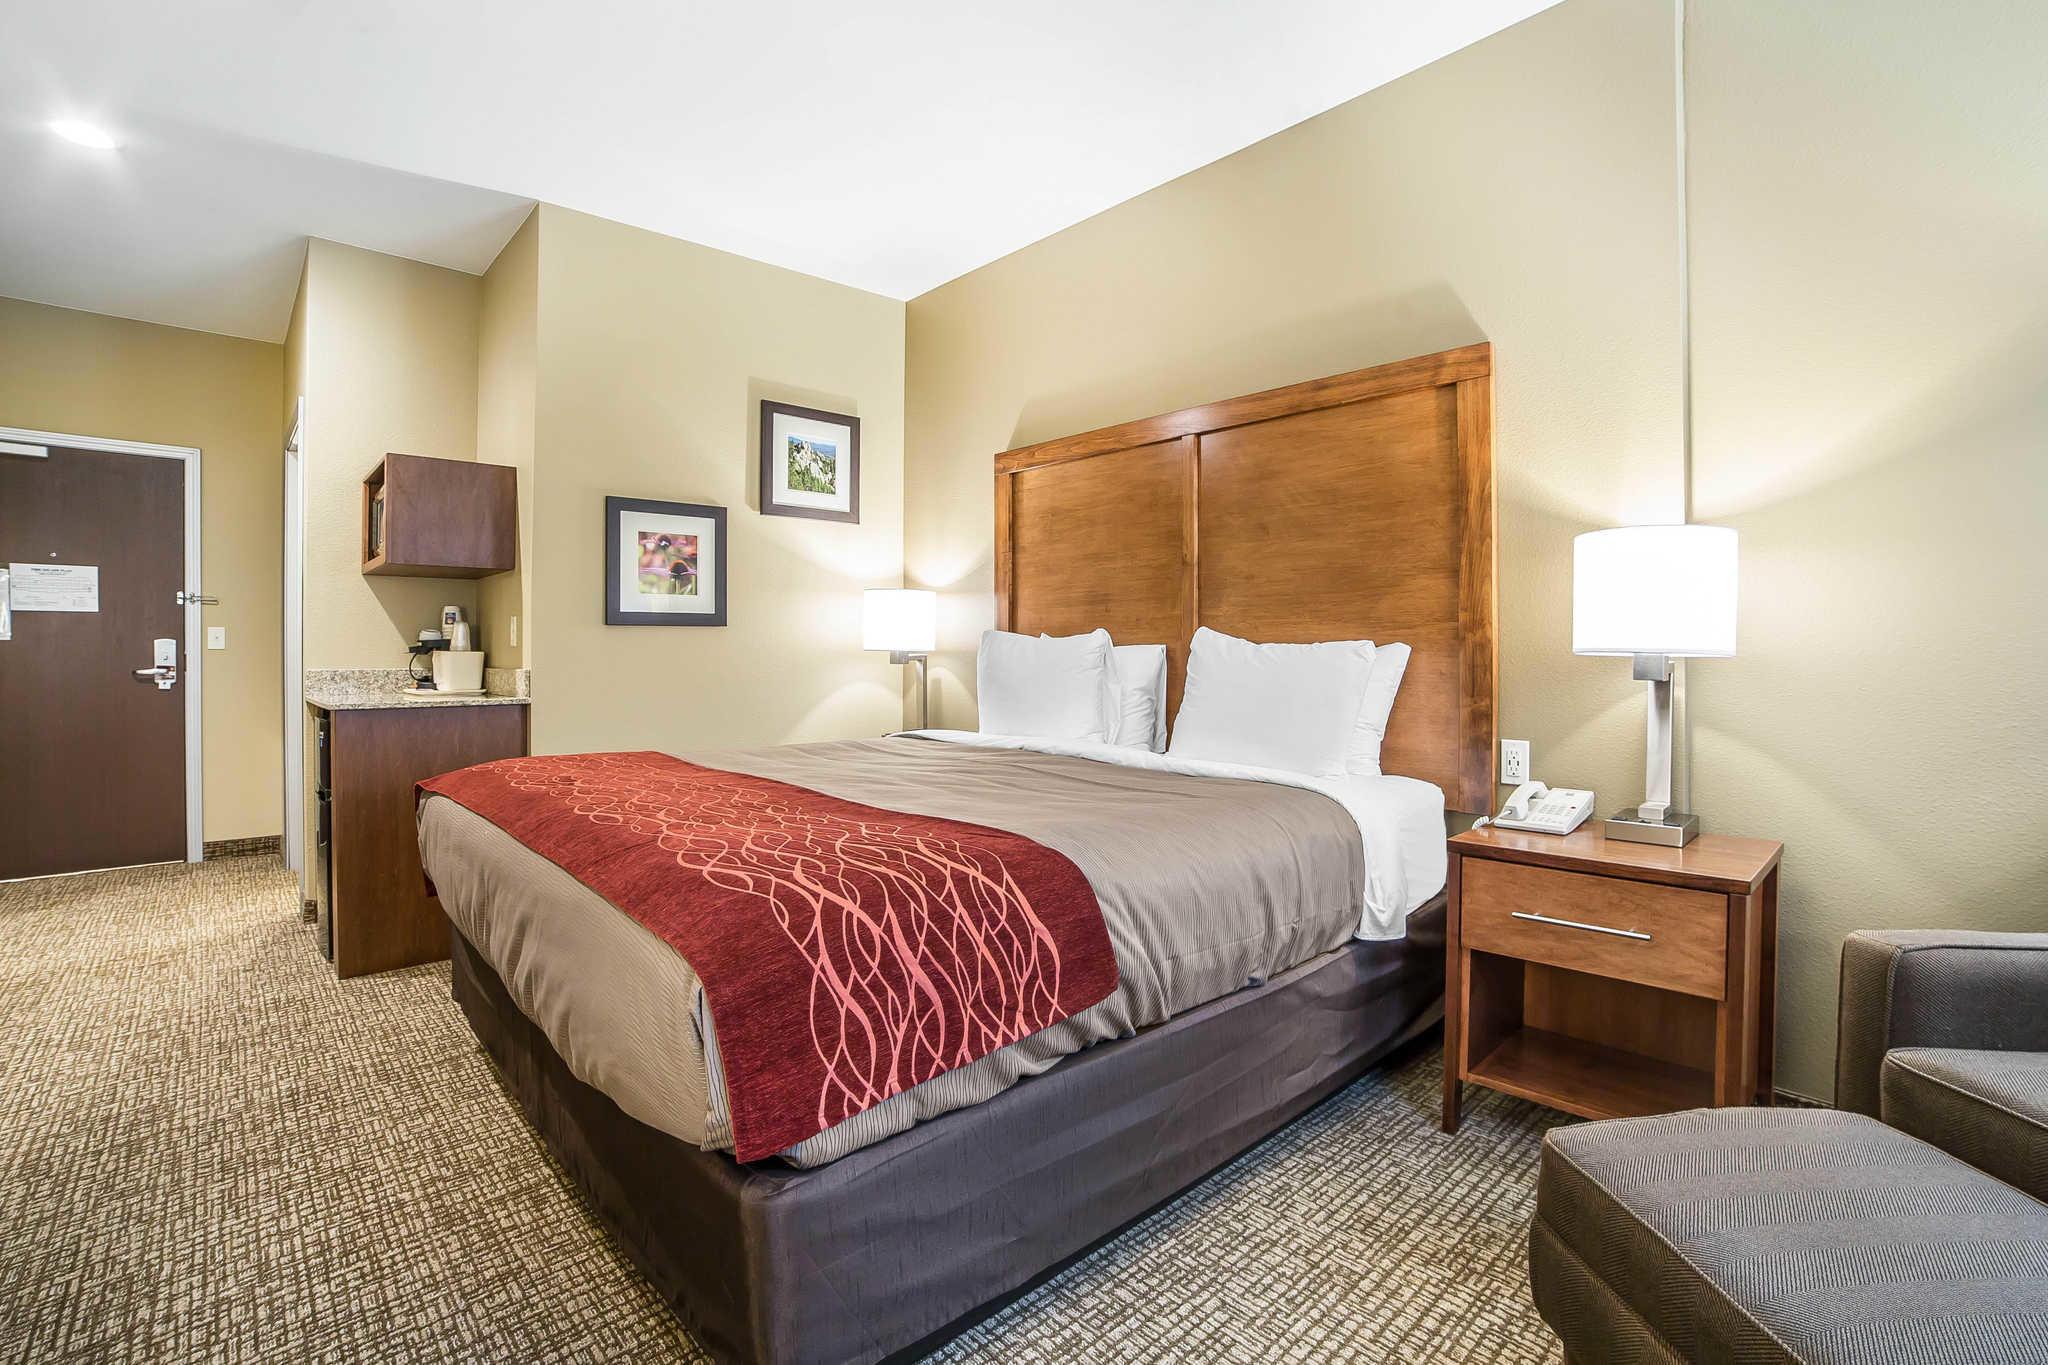 Comfort Inn & Suites Near Mt. Rushmore image 7